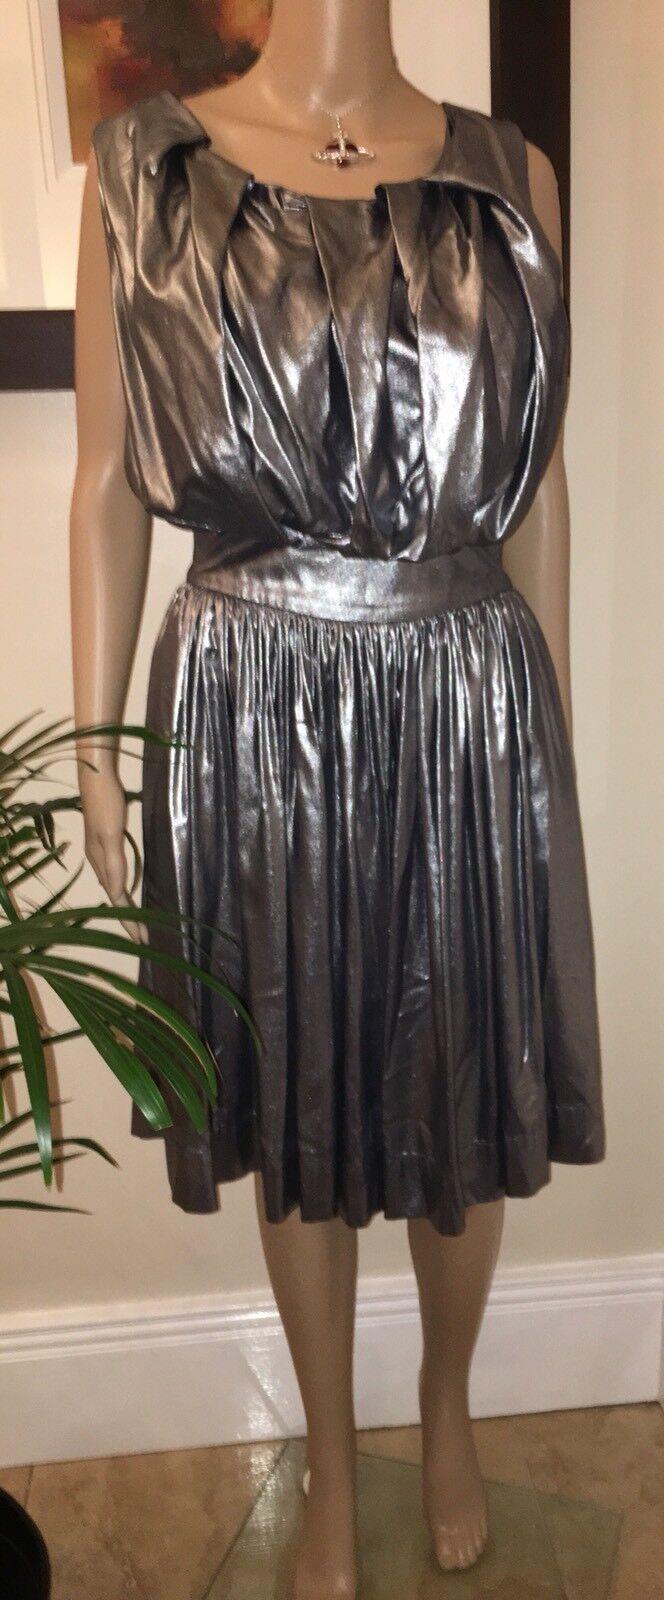 Vivienne Westwood  Anglomania Gardner argentoo Pleat Dress 42